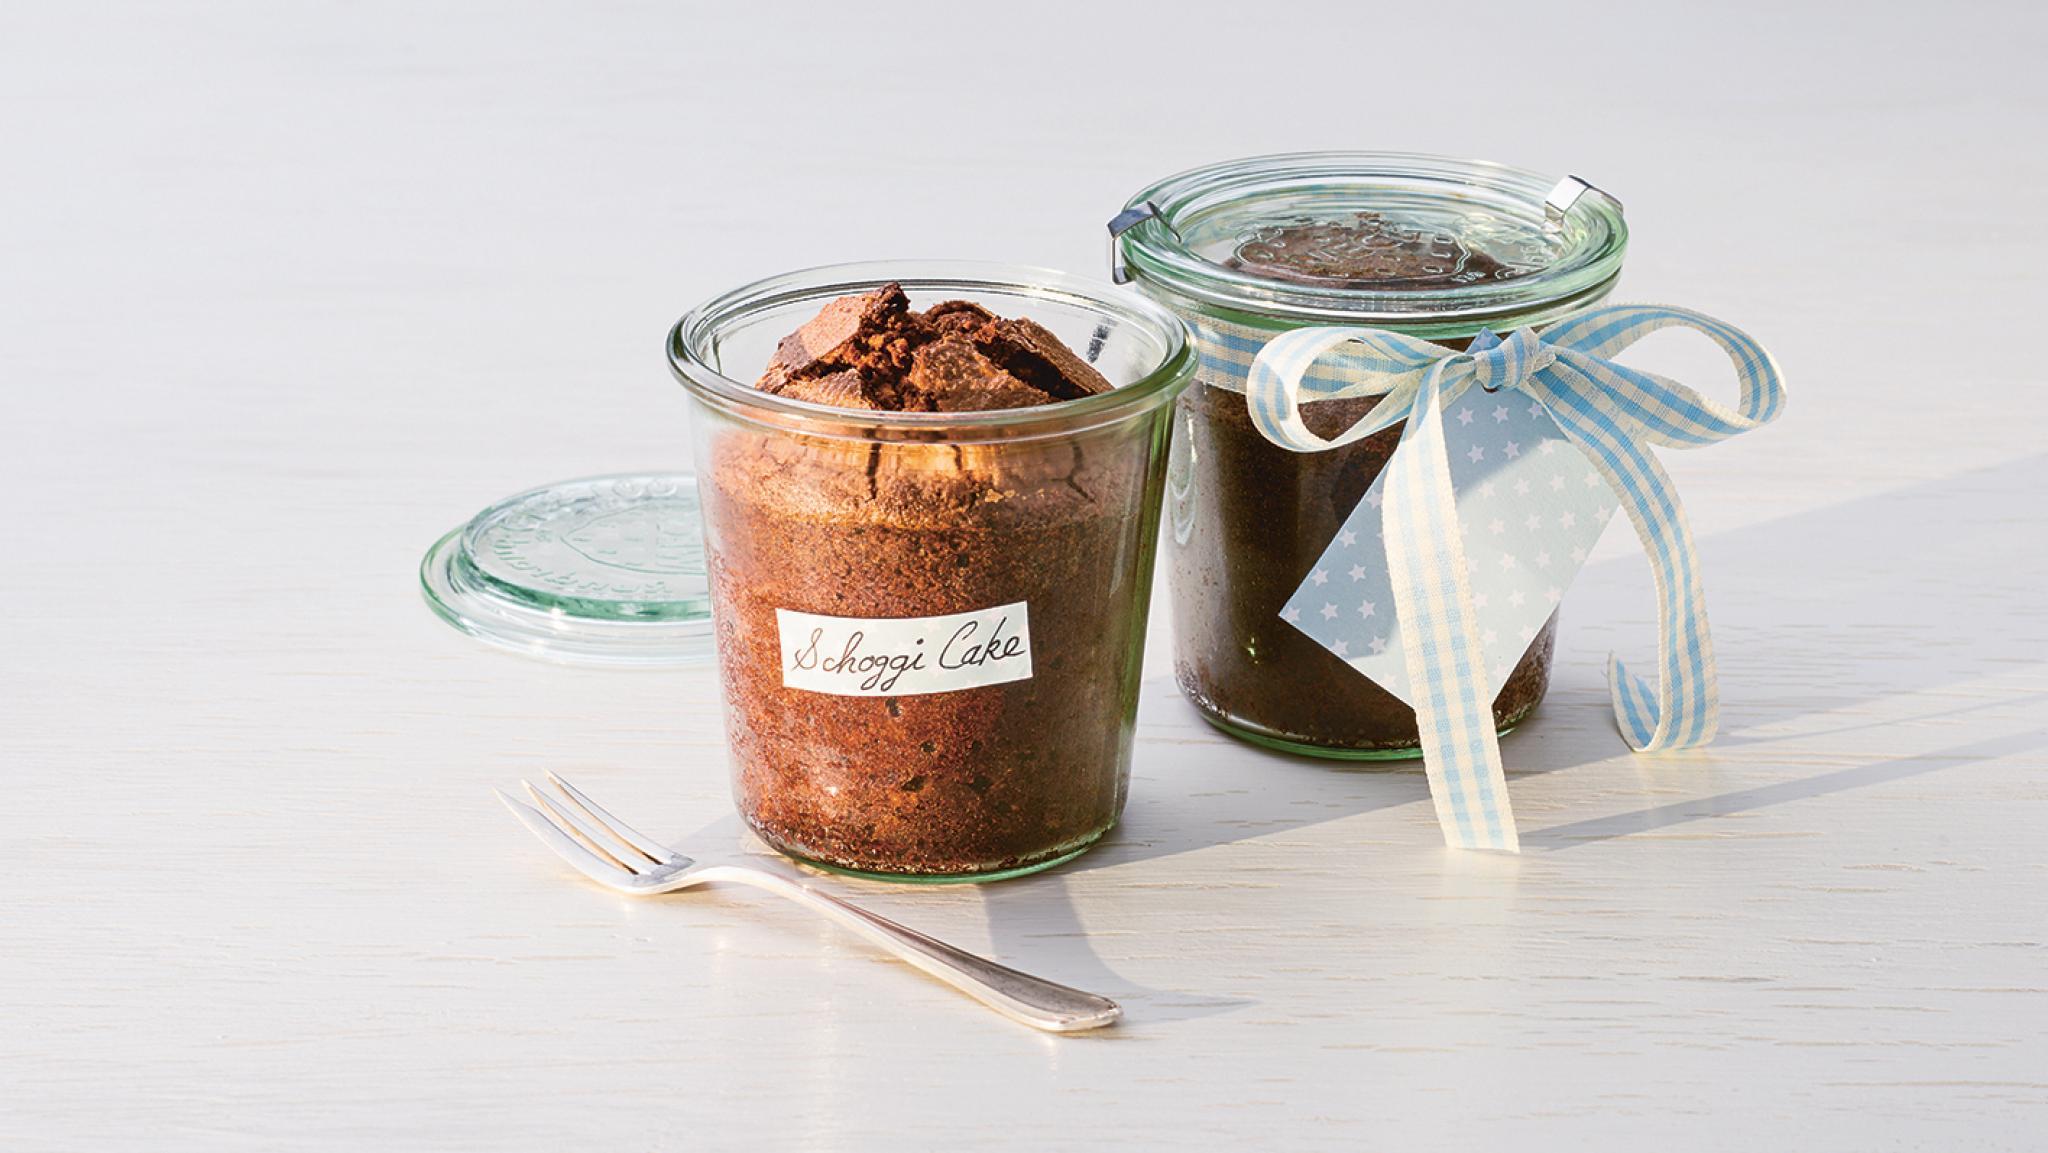 Schokoladen-Haselnuss-Kuchen